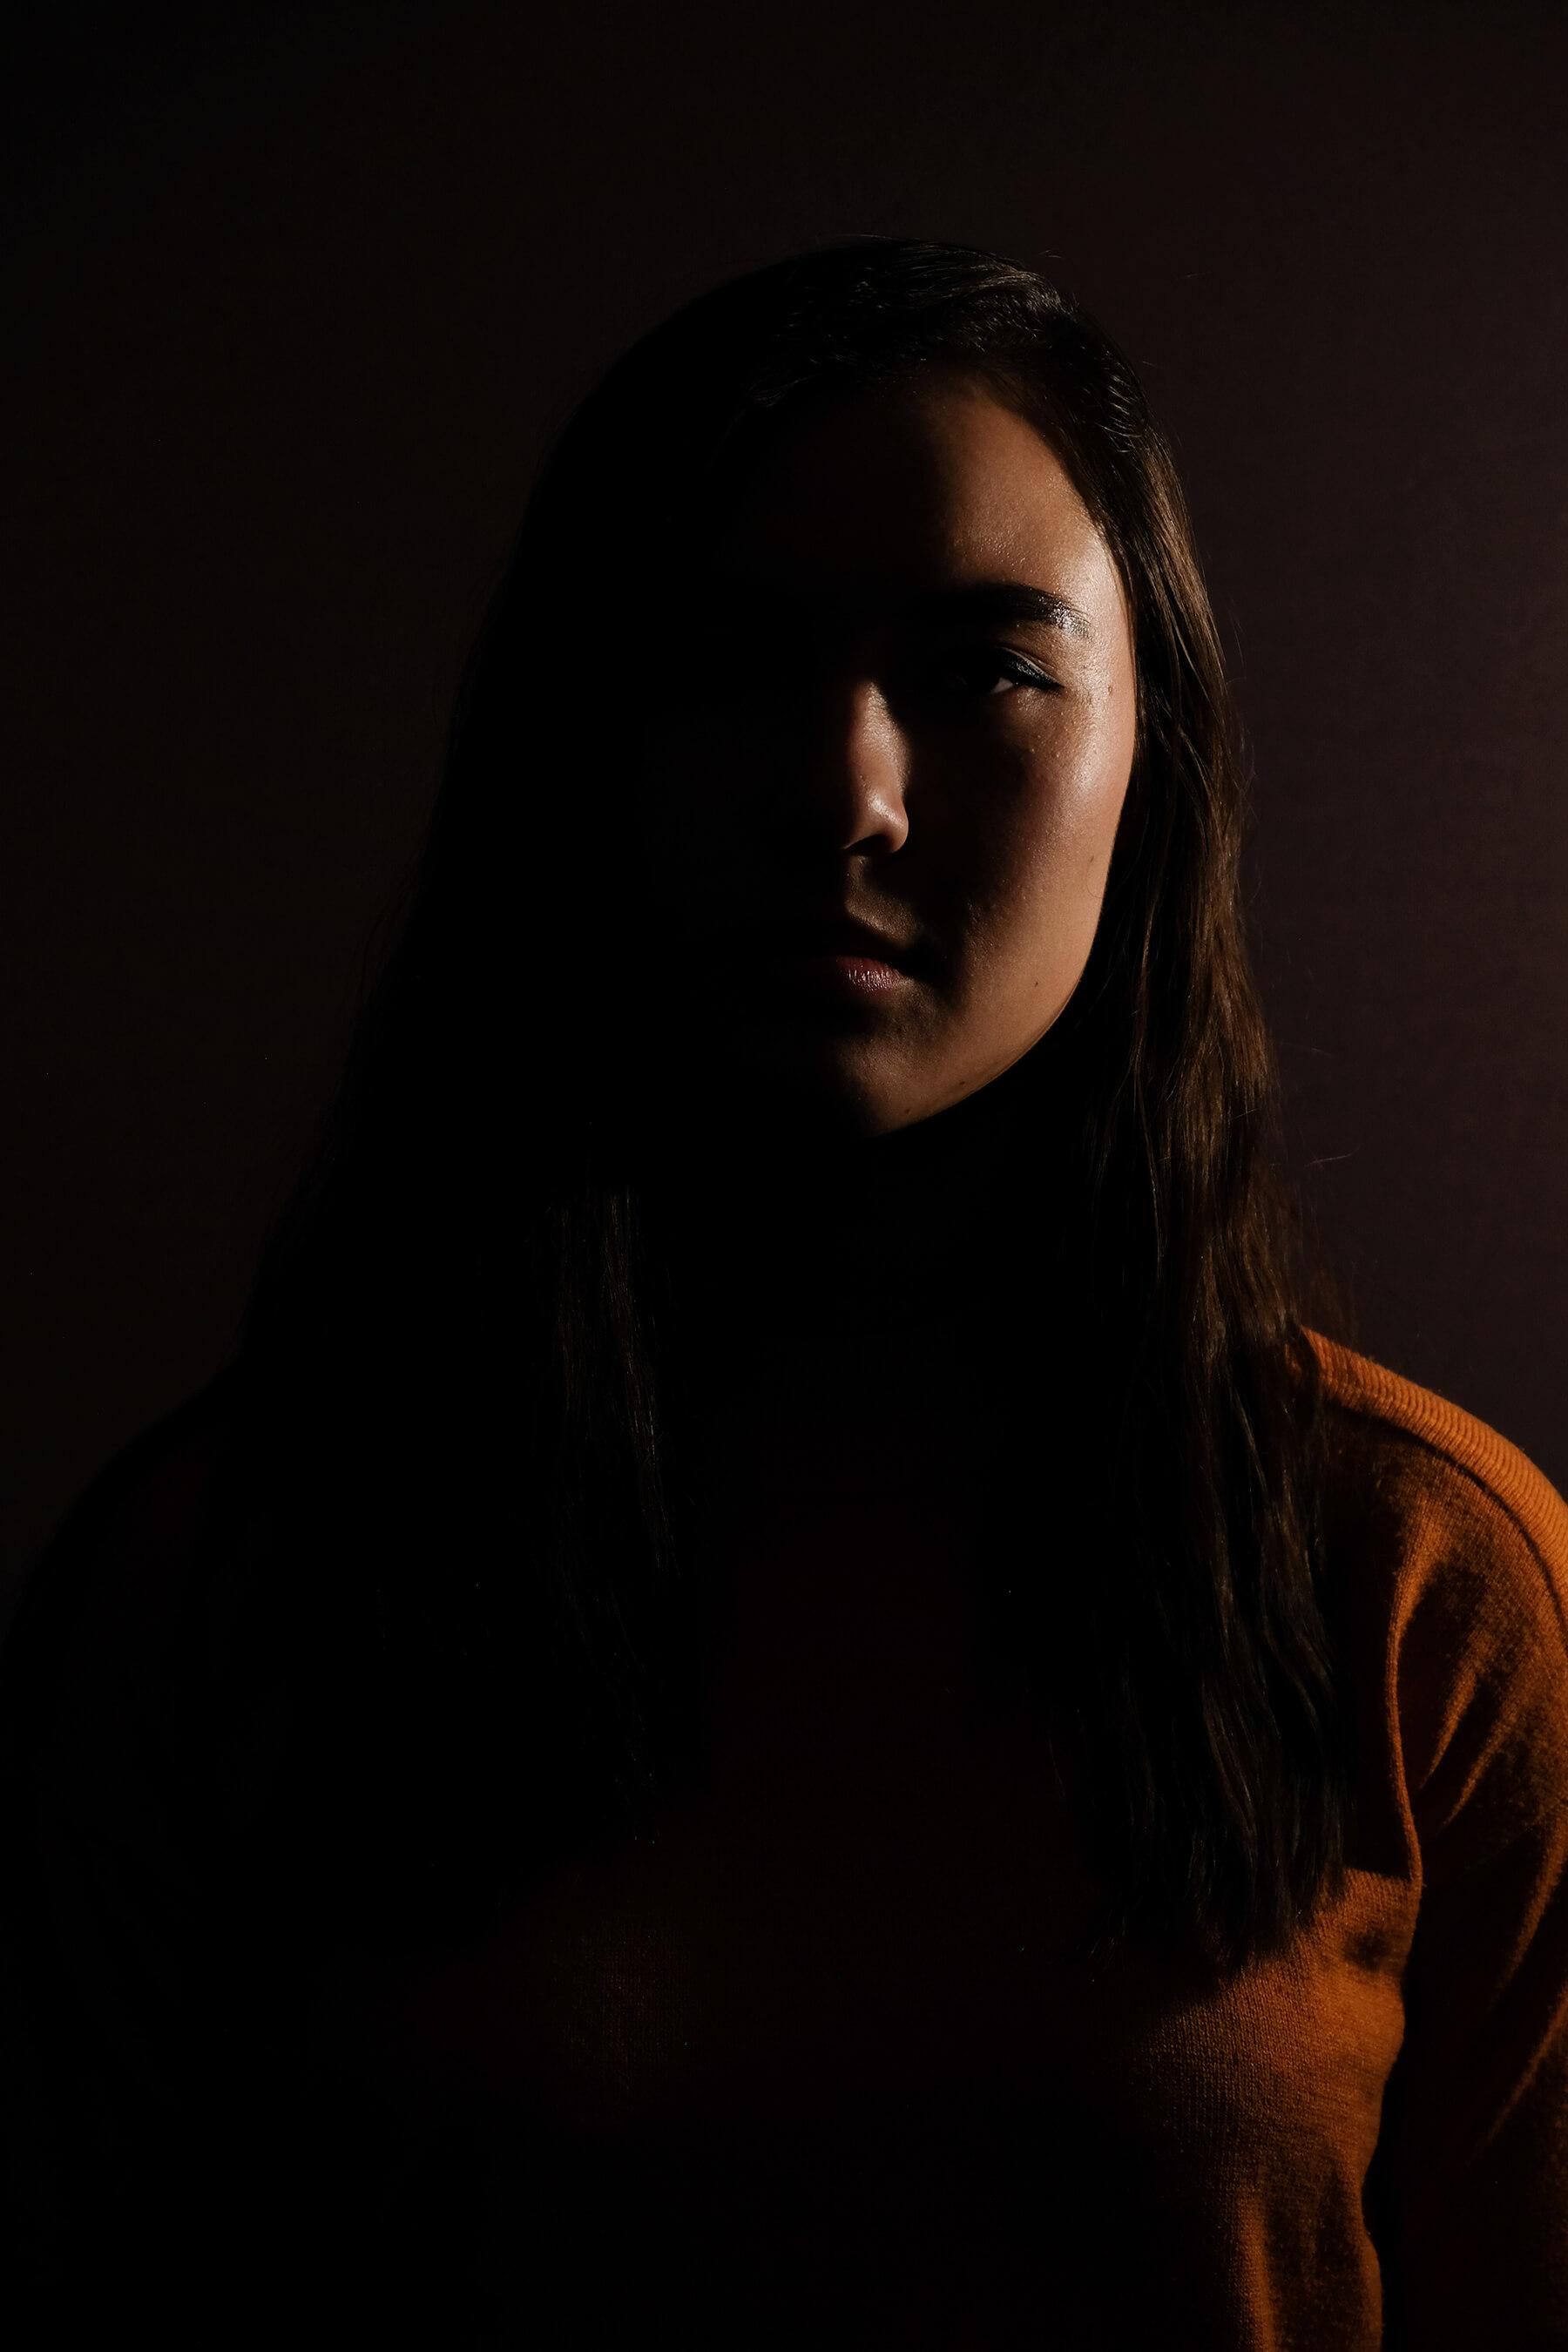 Portrait with split lighting